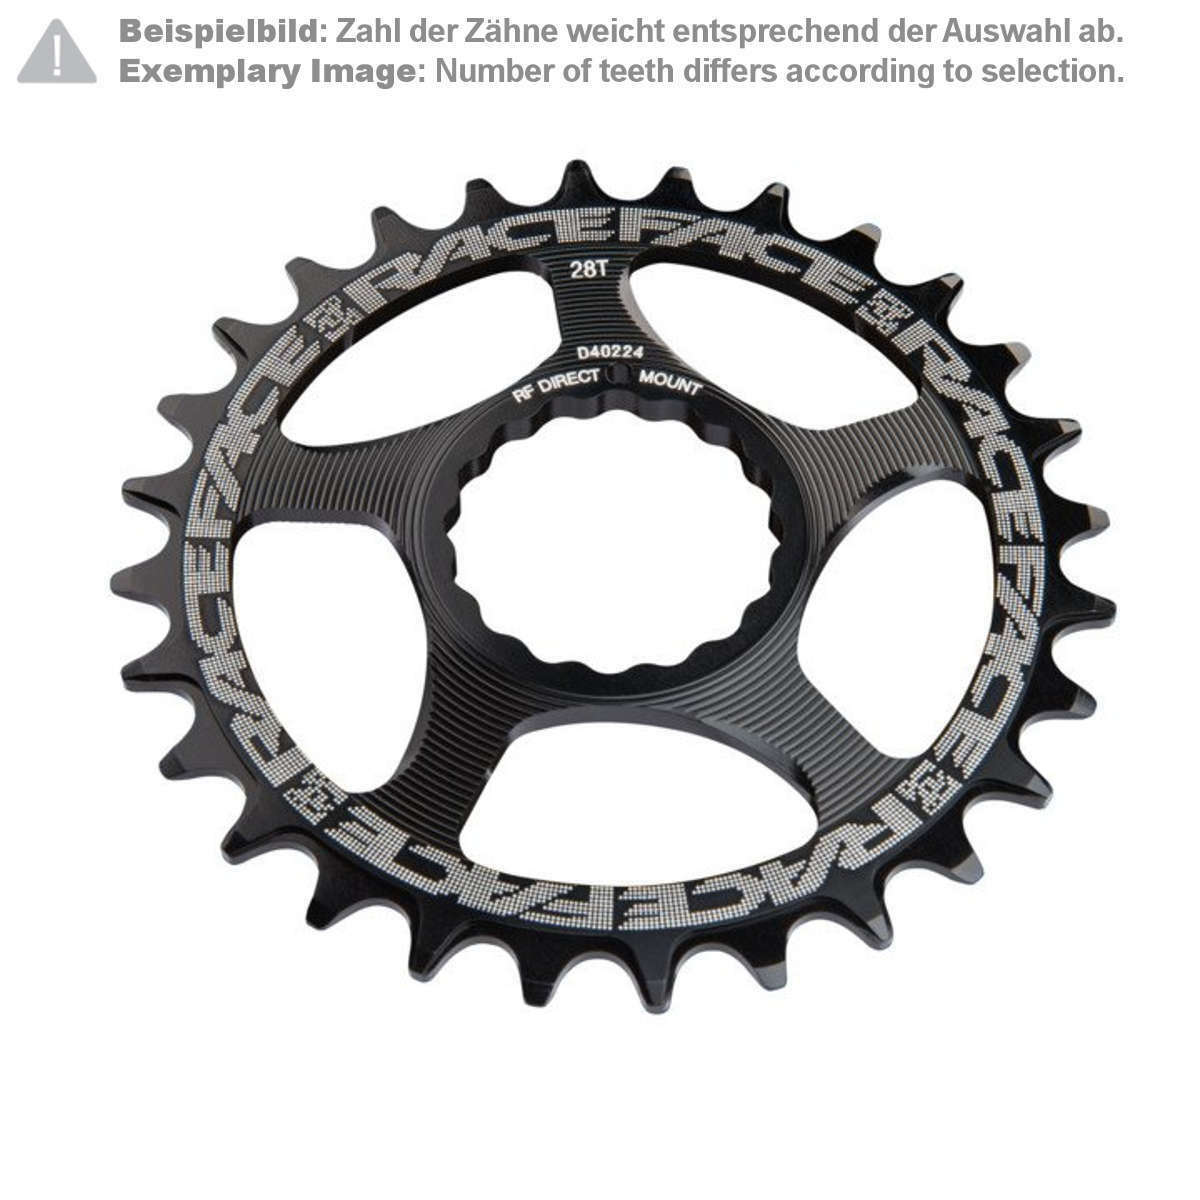 Race Face MTB-Kettenblatt  Schwarz Direct Mount, Cinch, für 10 11 12-Fach